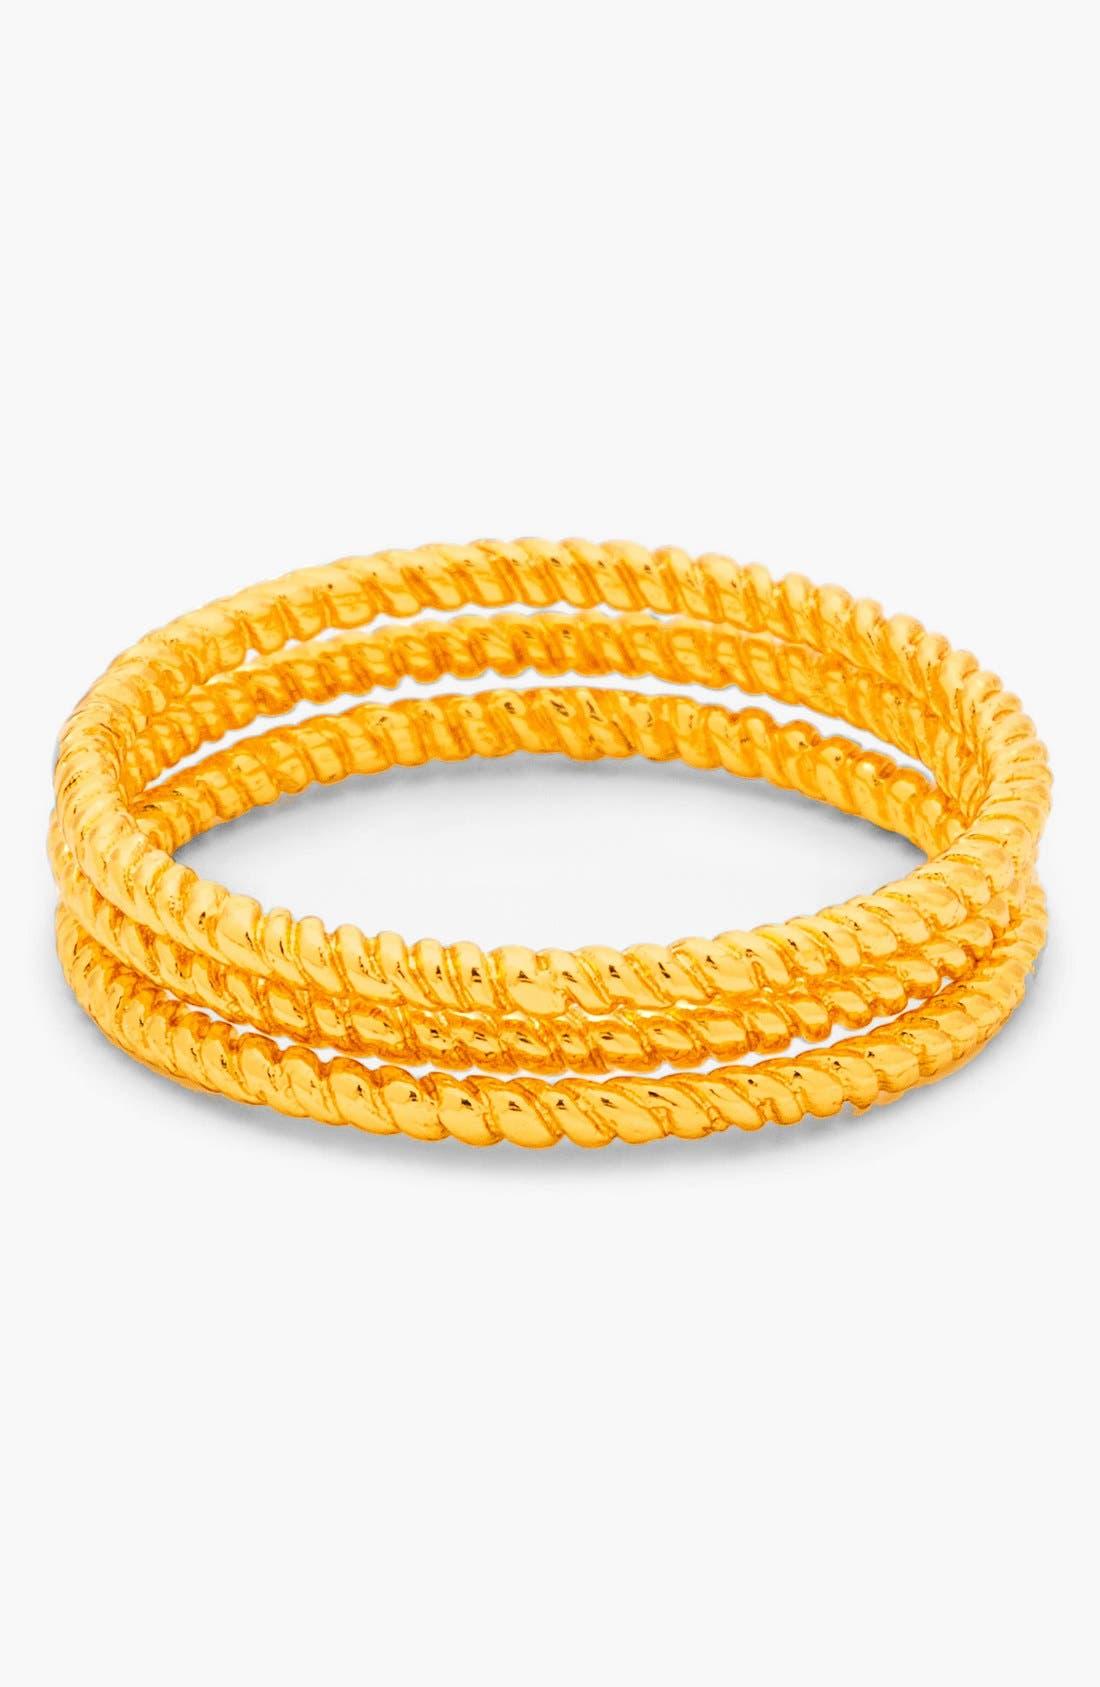 Alternate Image 1 Selected - gorjana Textured Rings (Set of 3)